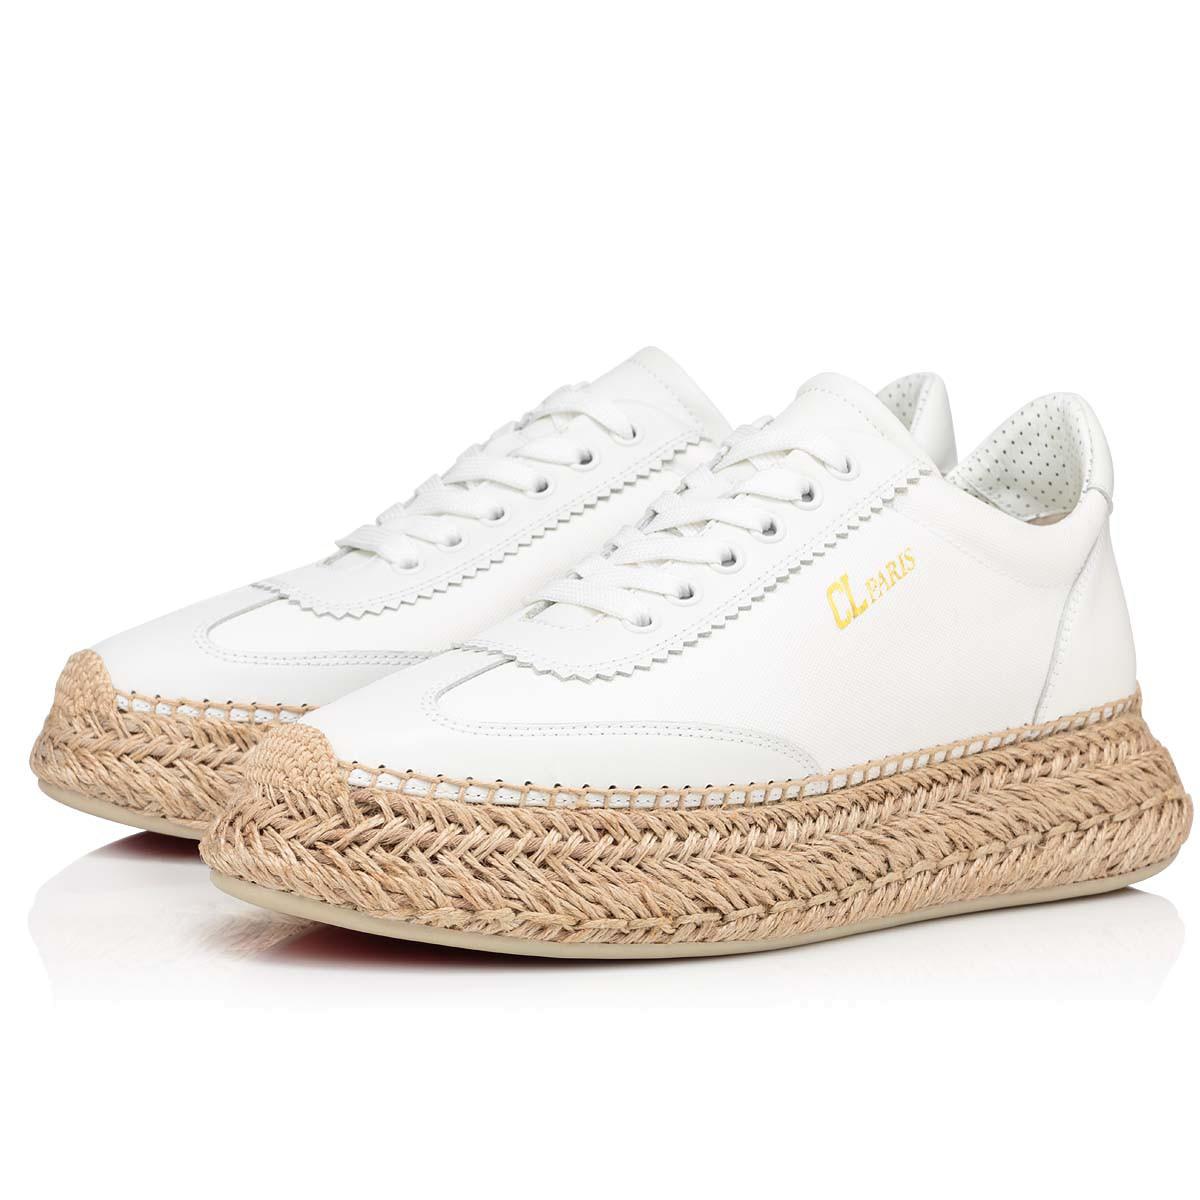 Shoes - Espasneak Flat - Christian Louboutin